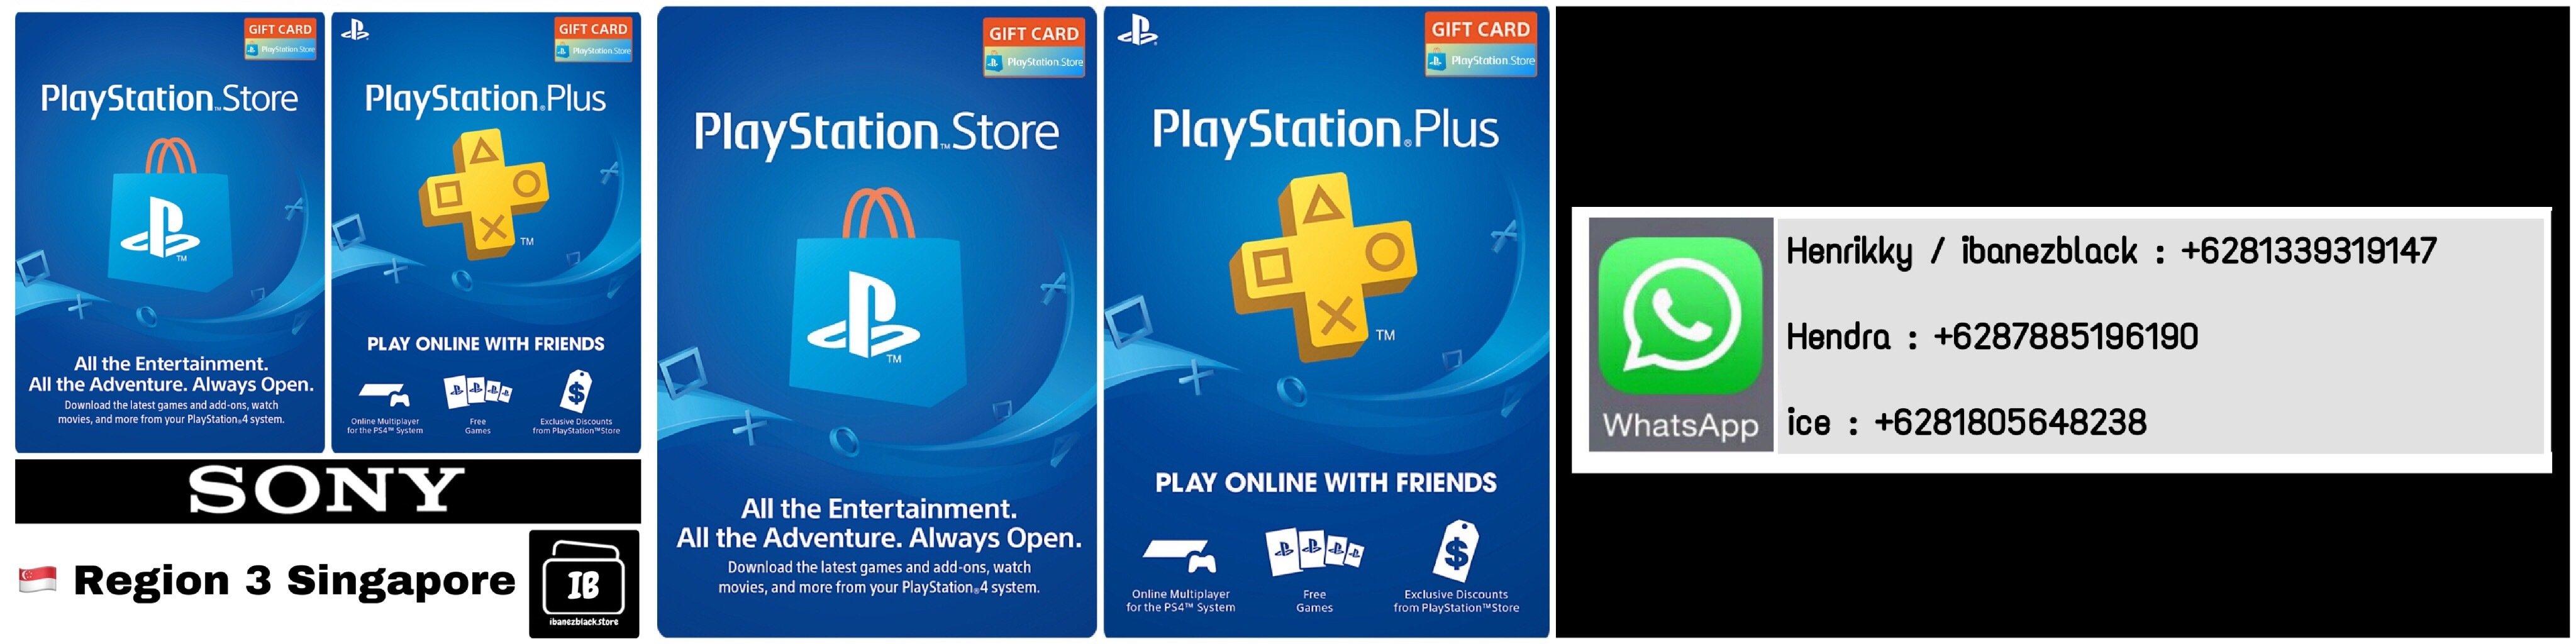 Playstation Store Gift Card (PSN Card) / Playstation Plus (PSN Plus) Singapore